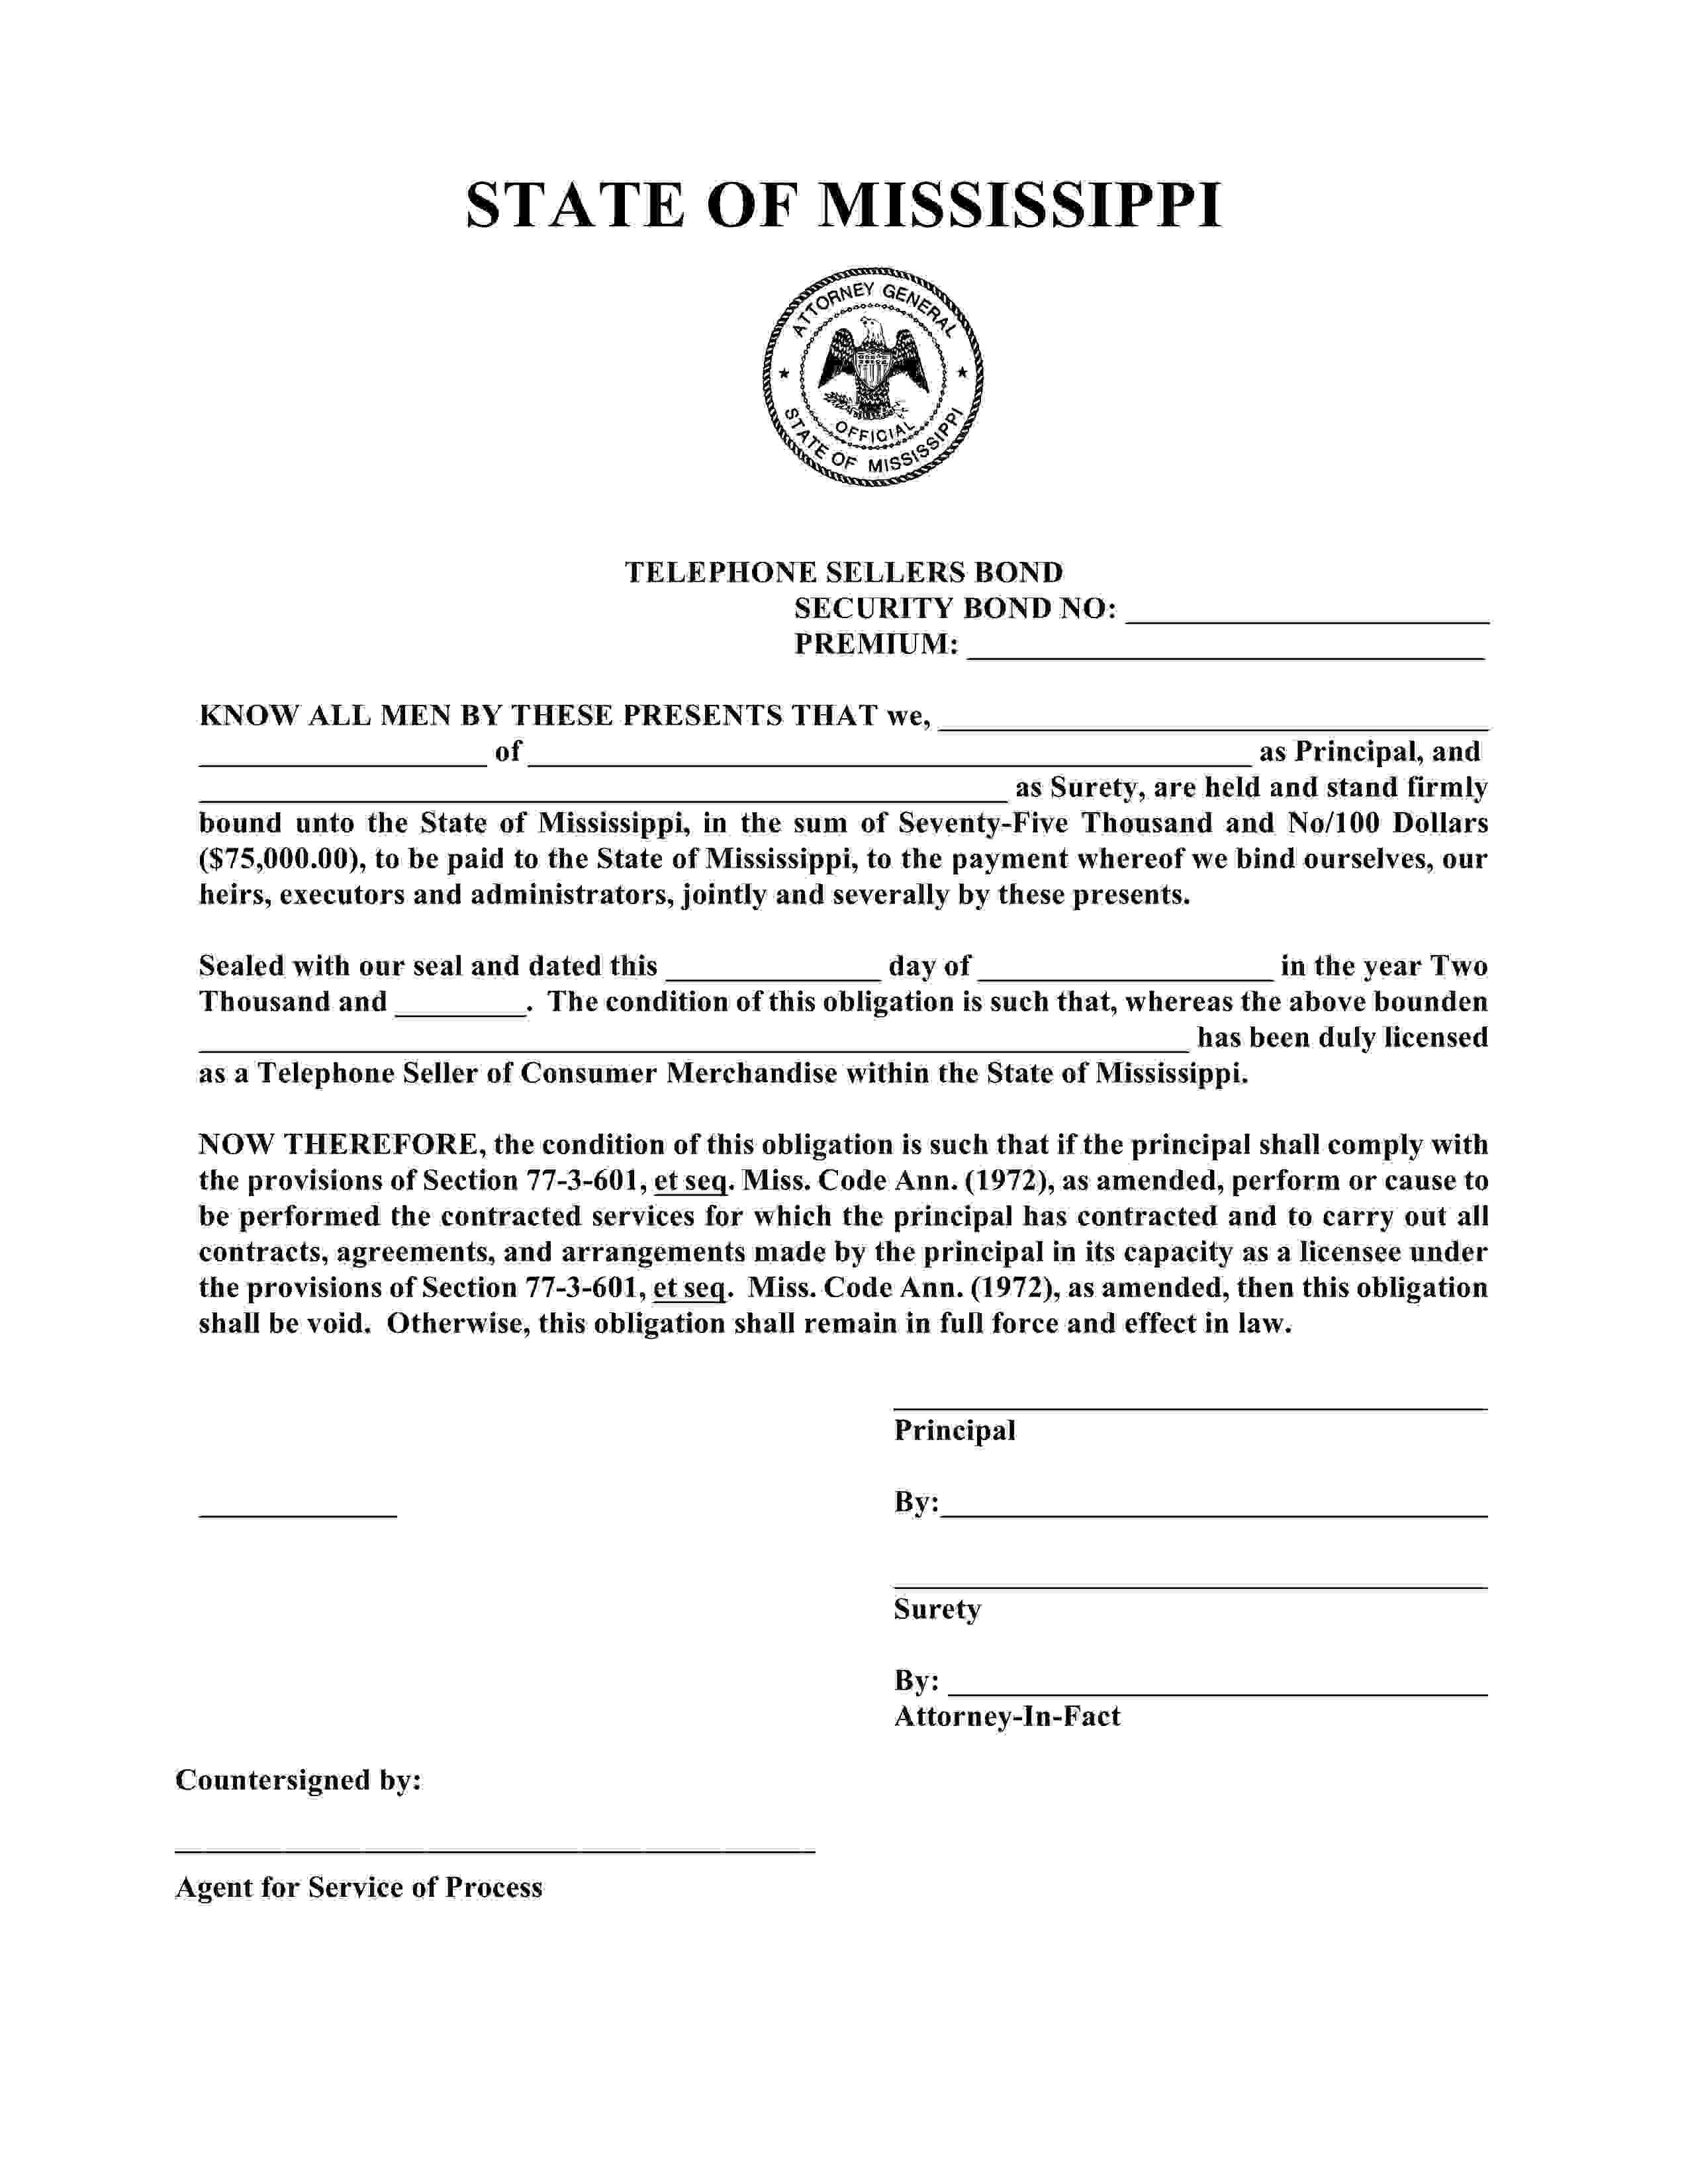 Mississippi Attorney General Telephone Seller Bond sample image